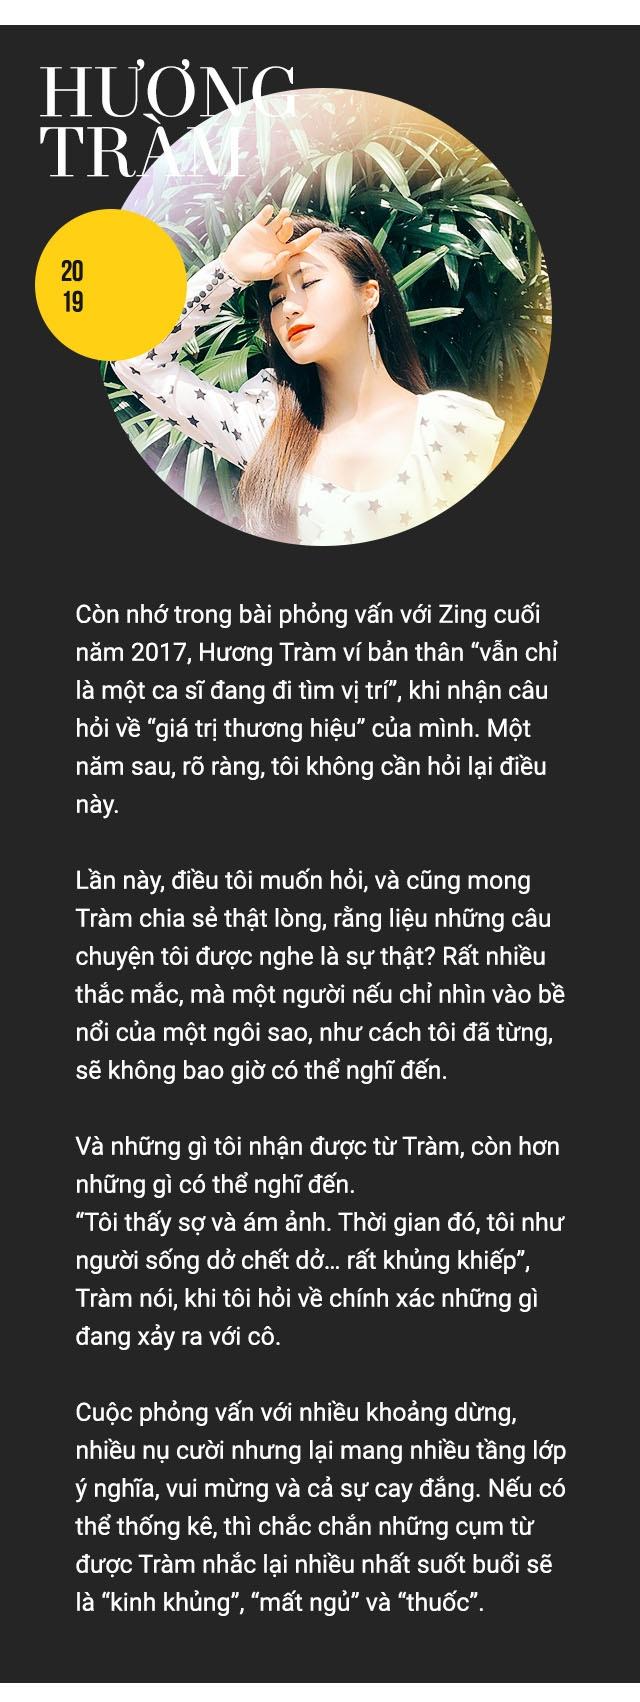 Huong Tram anh 3